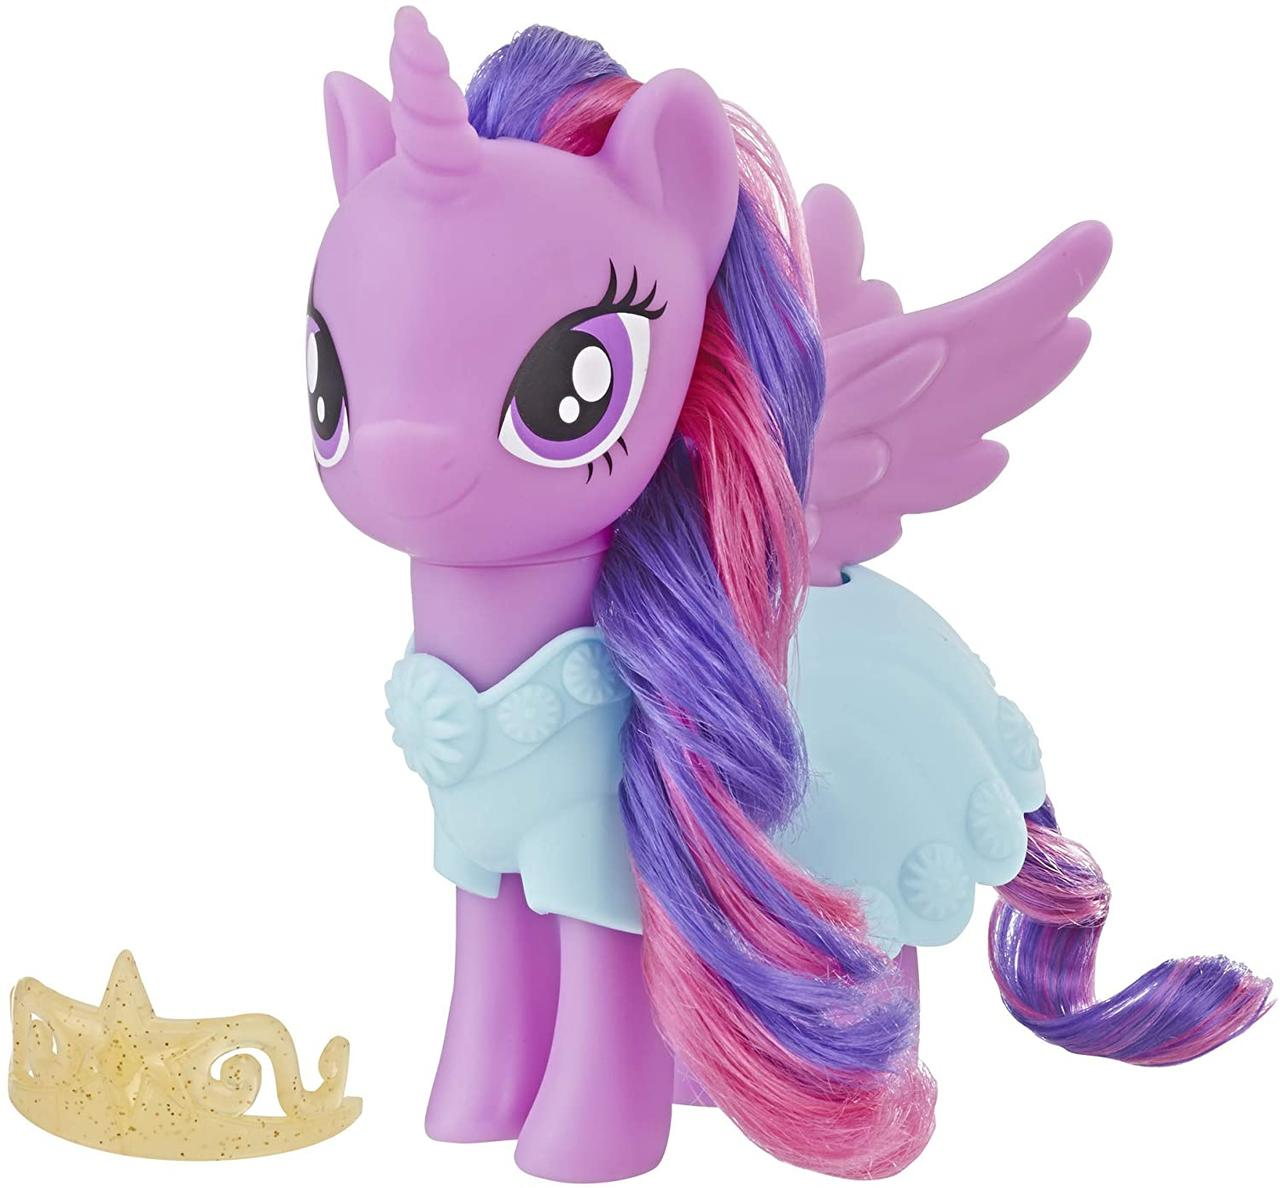 My Little Pony Твайлайт Спаркл Іскорка в святковому вбранні E5611 E5551 Dress Up Friendship Twilight Sparkle